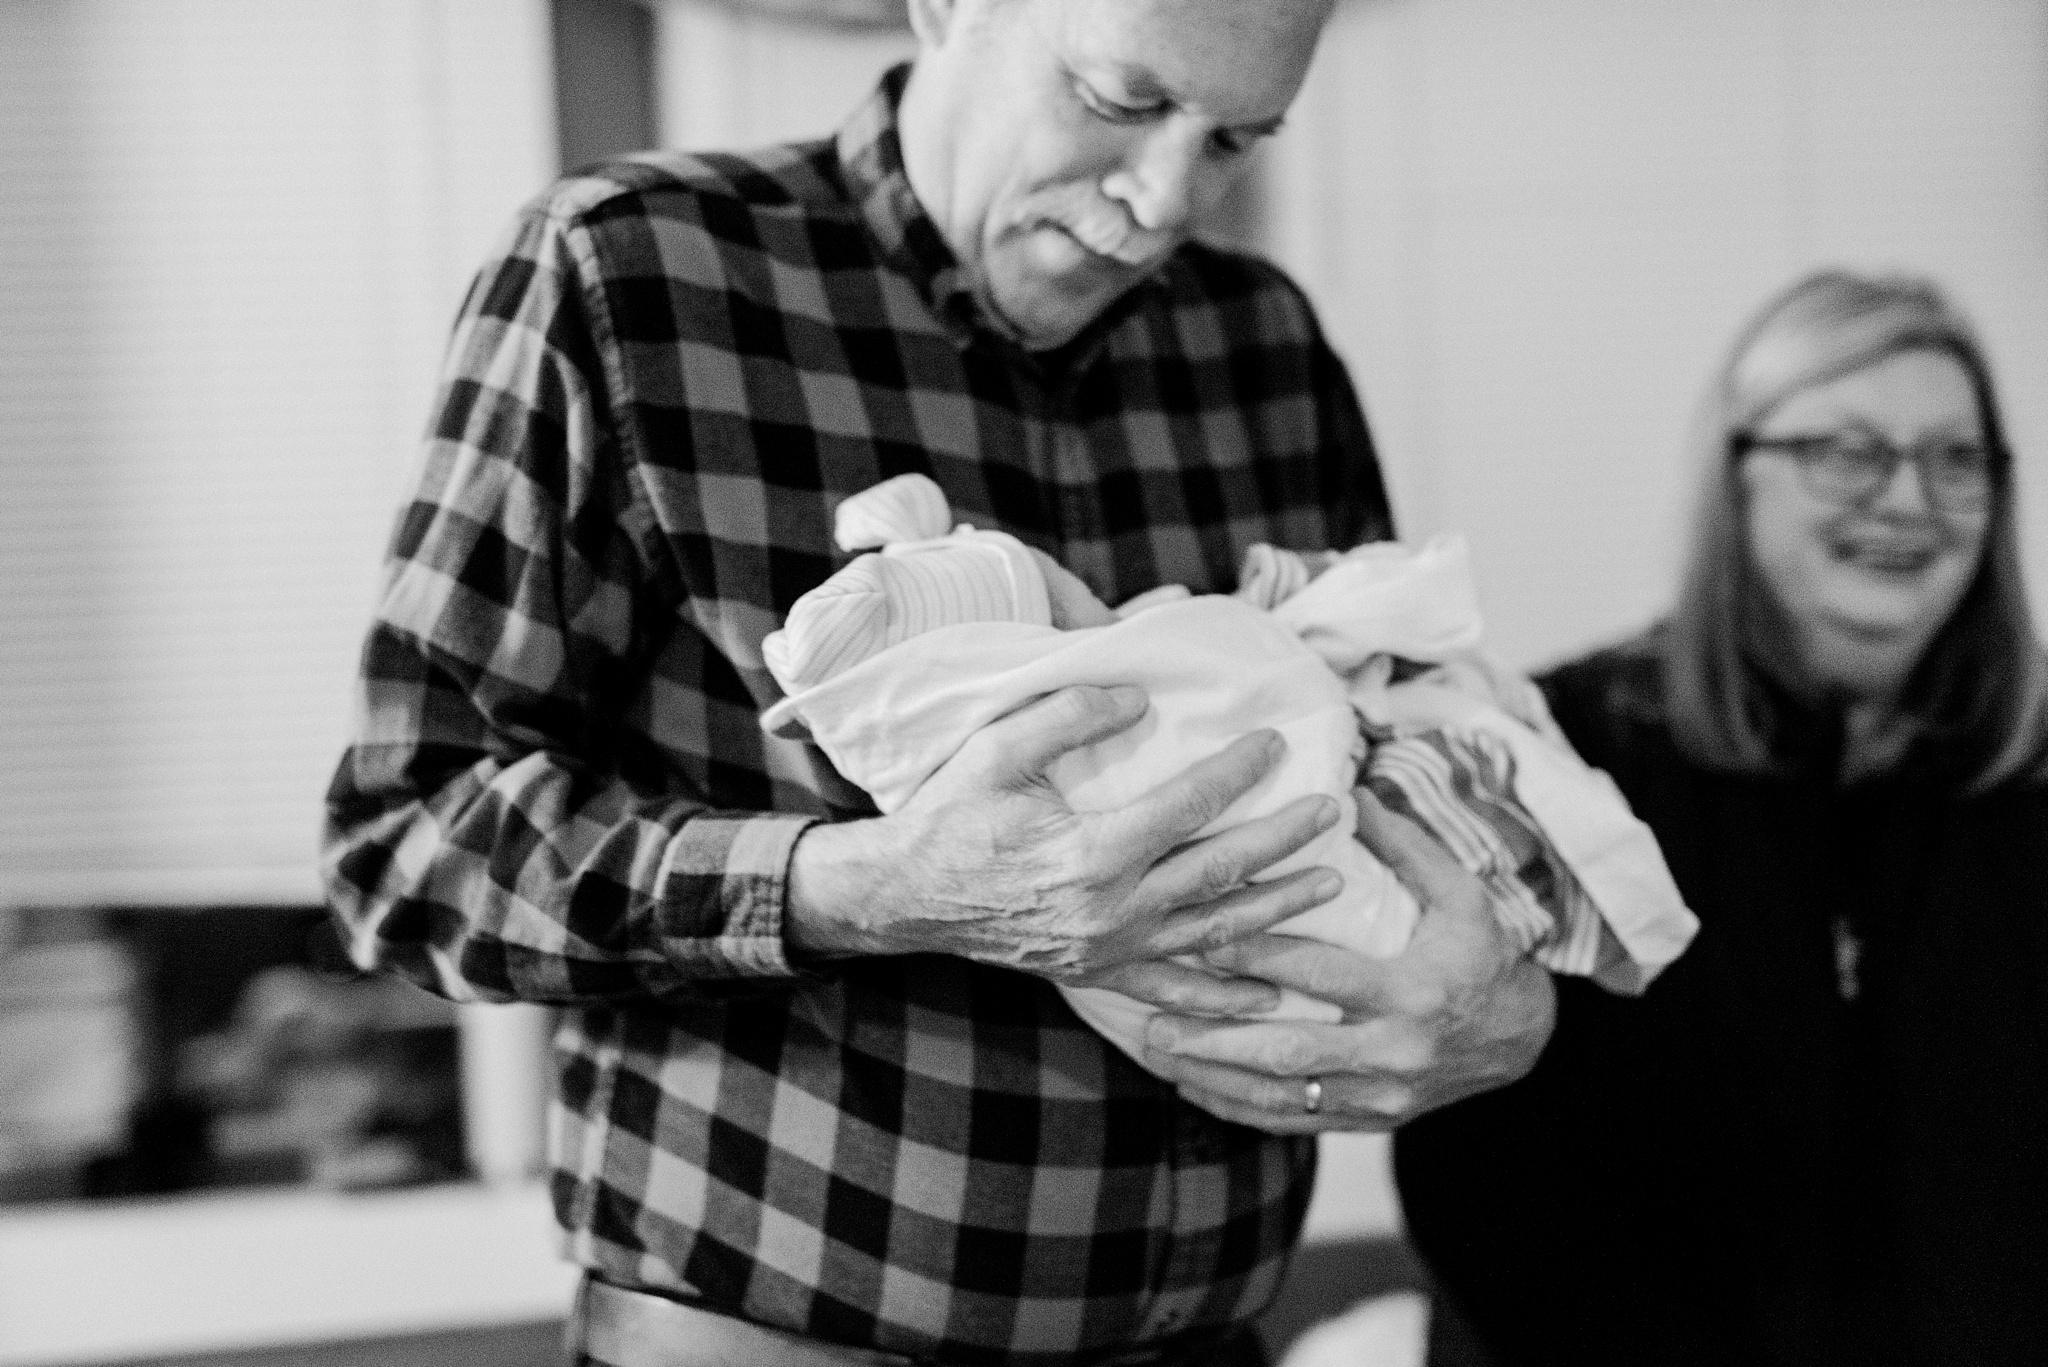 atlanta-birth-photographer-piedmont-fayette-hospital-birth-mallievinson-155.jpg